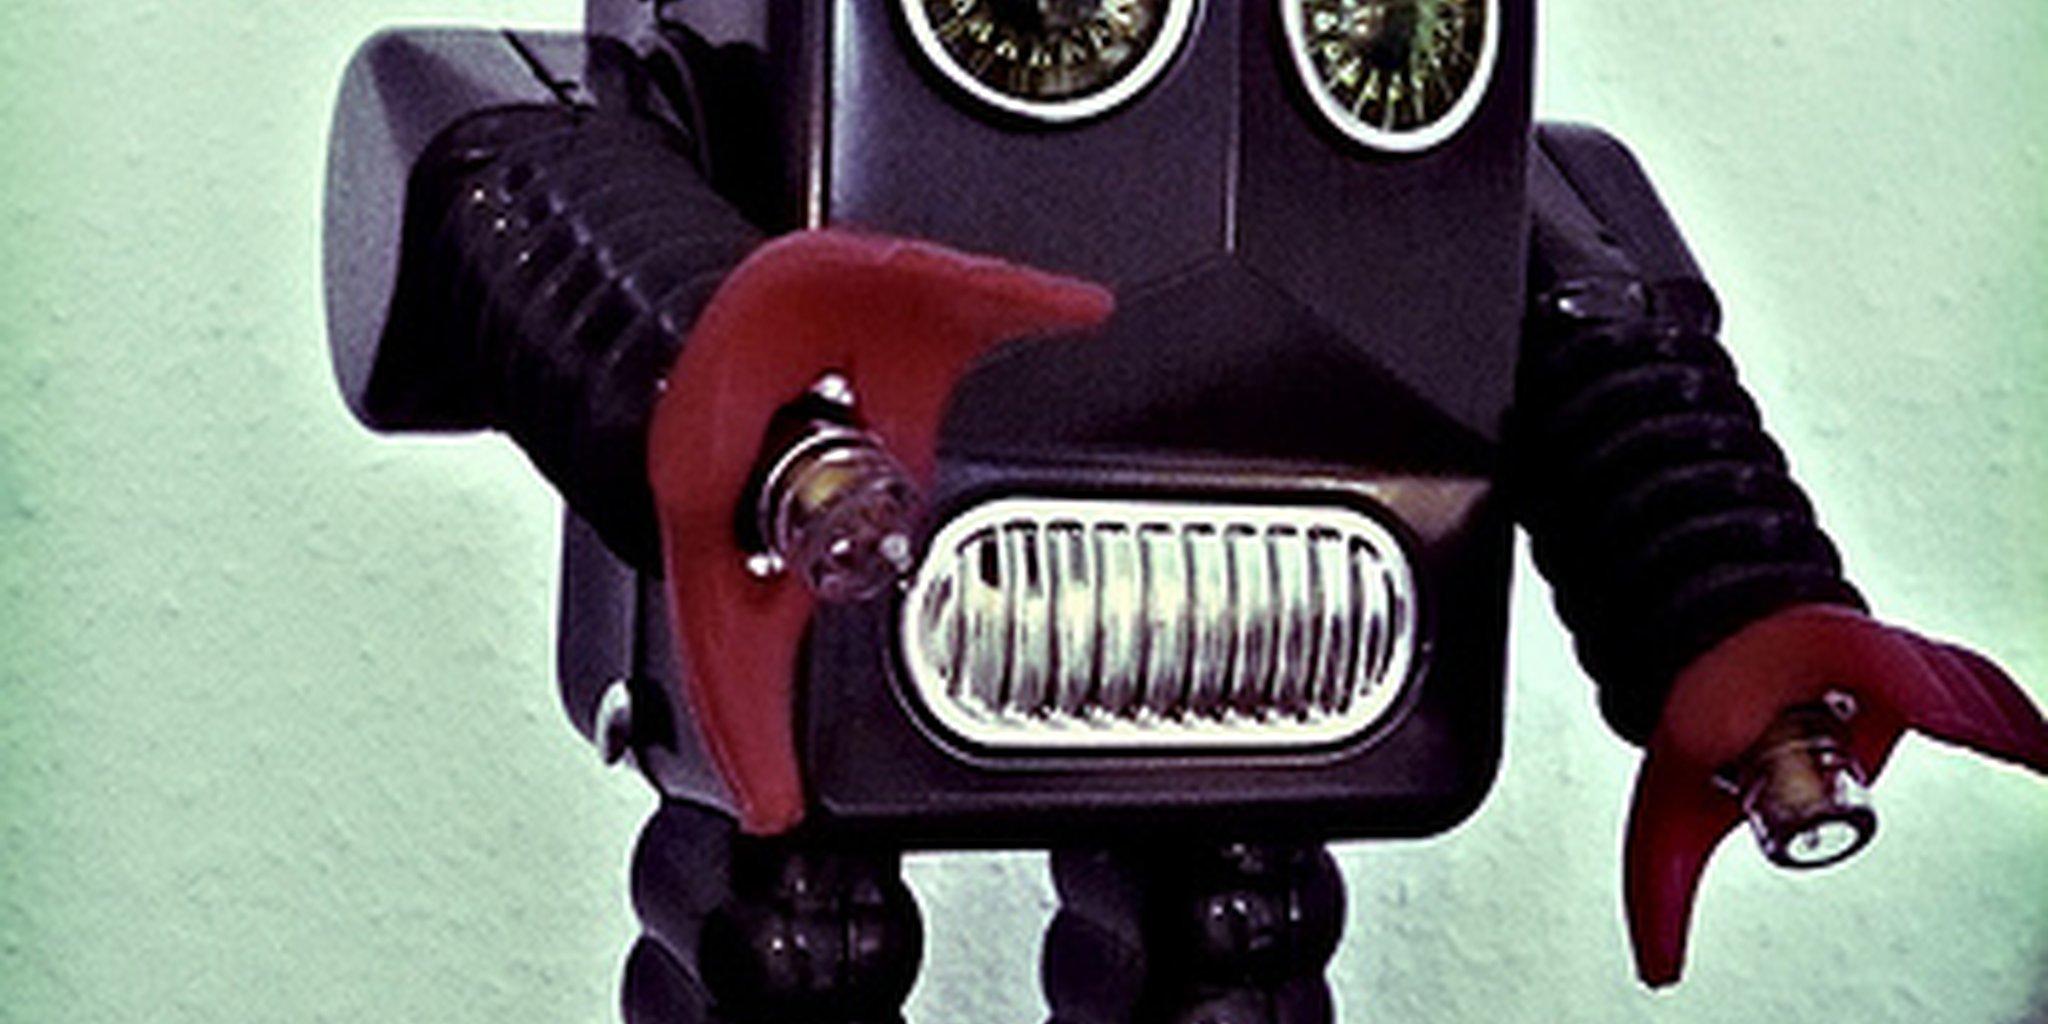 subscriber robot